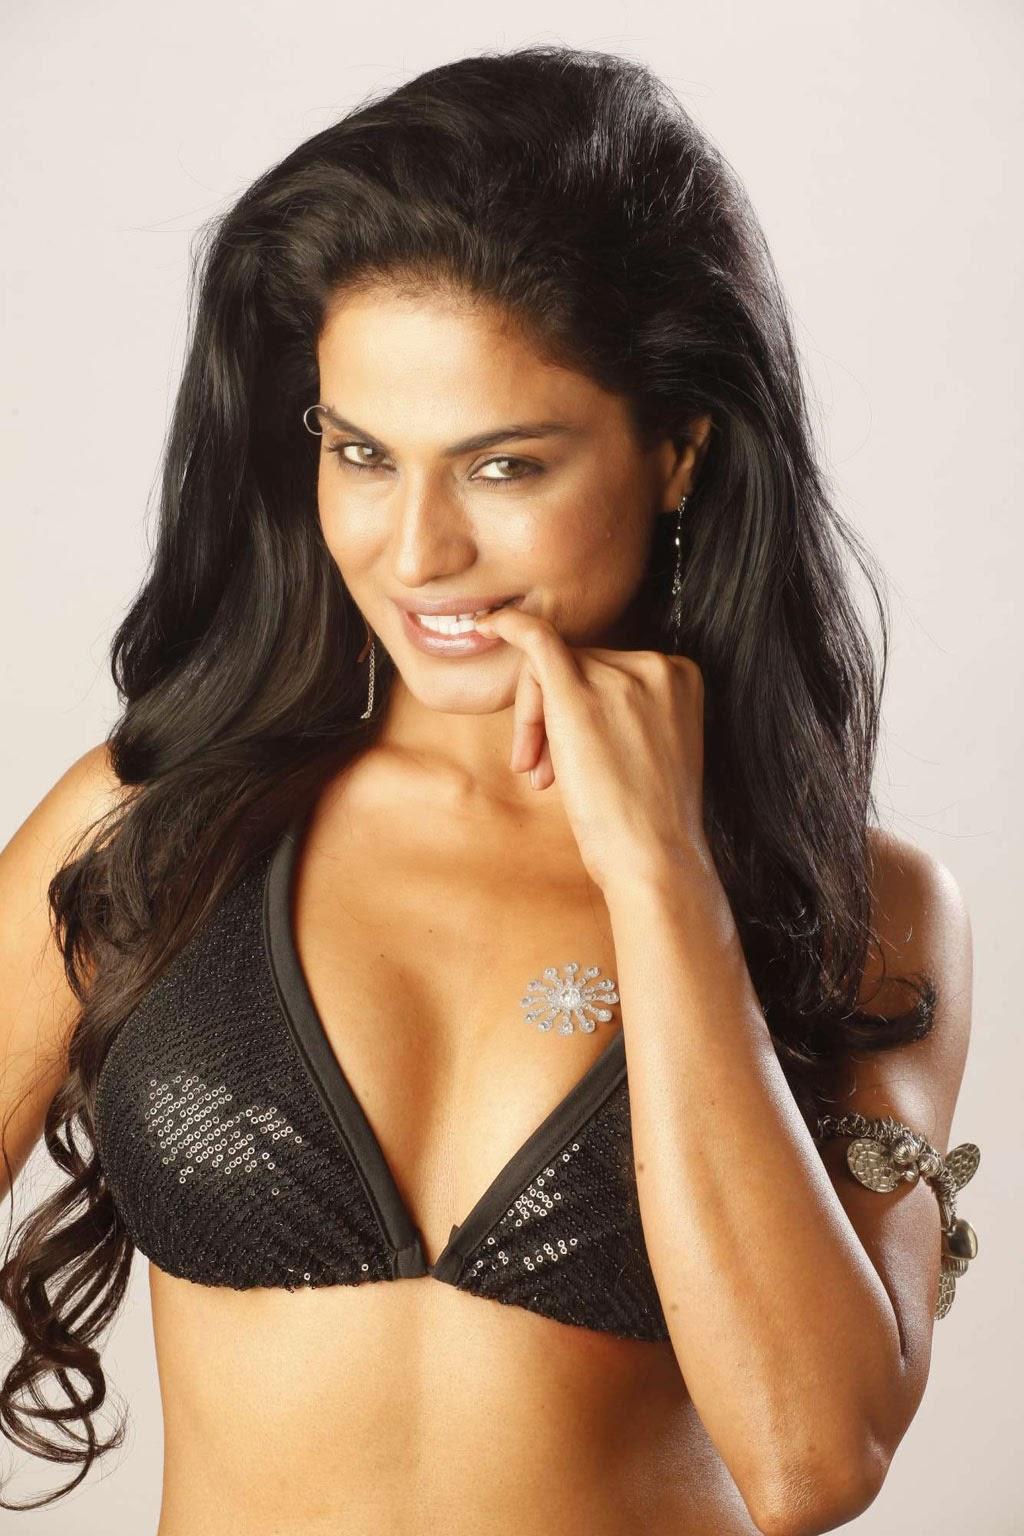 Pakistani Actress Veena Malik Sexy Boobs Collections -1174